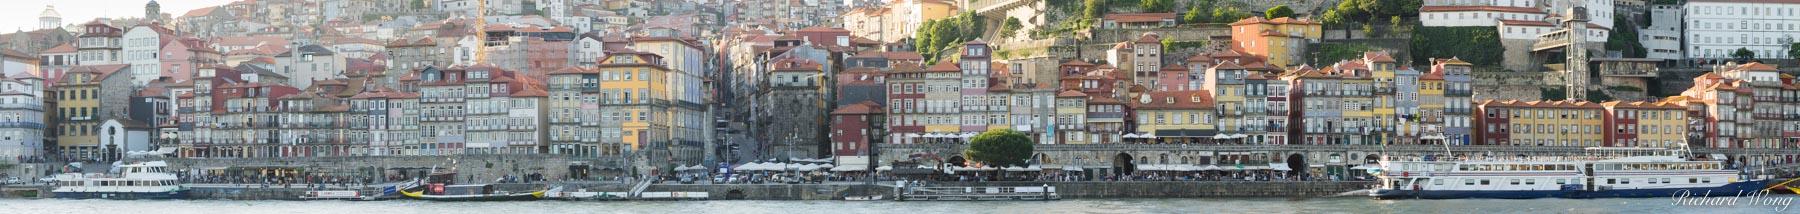 Ribeira Waterfront (UNESCO World Heritage Site) Panoramic, Porto, Portugal, photo, photo